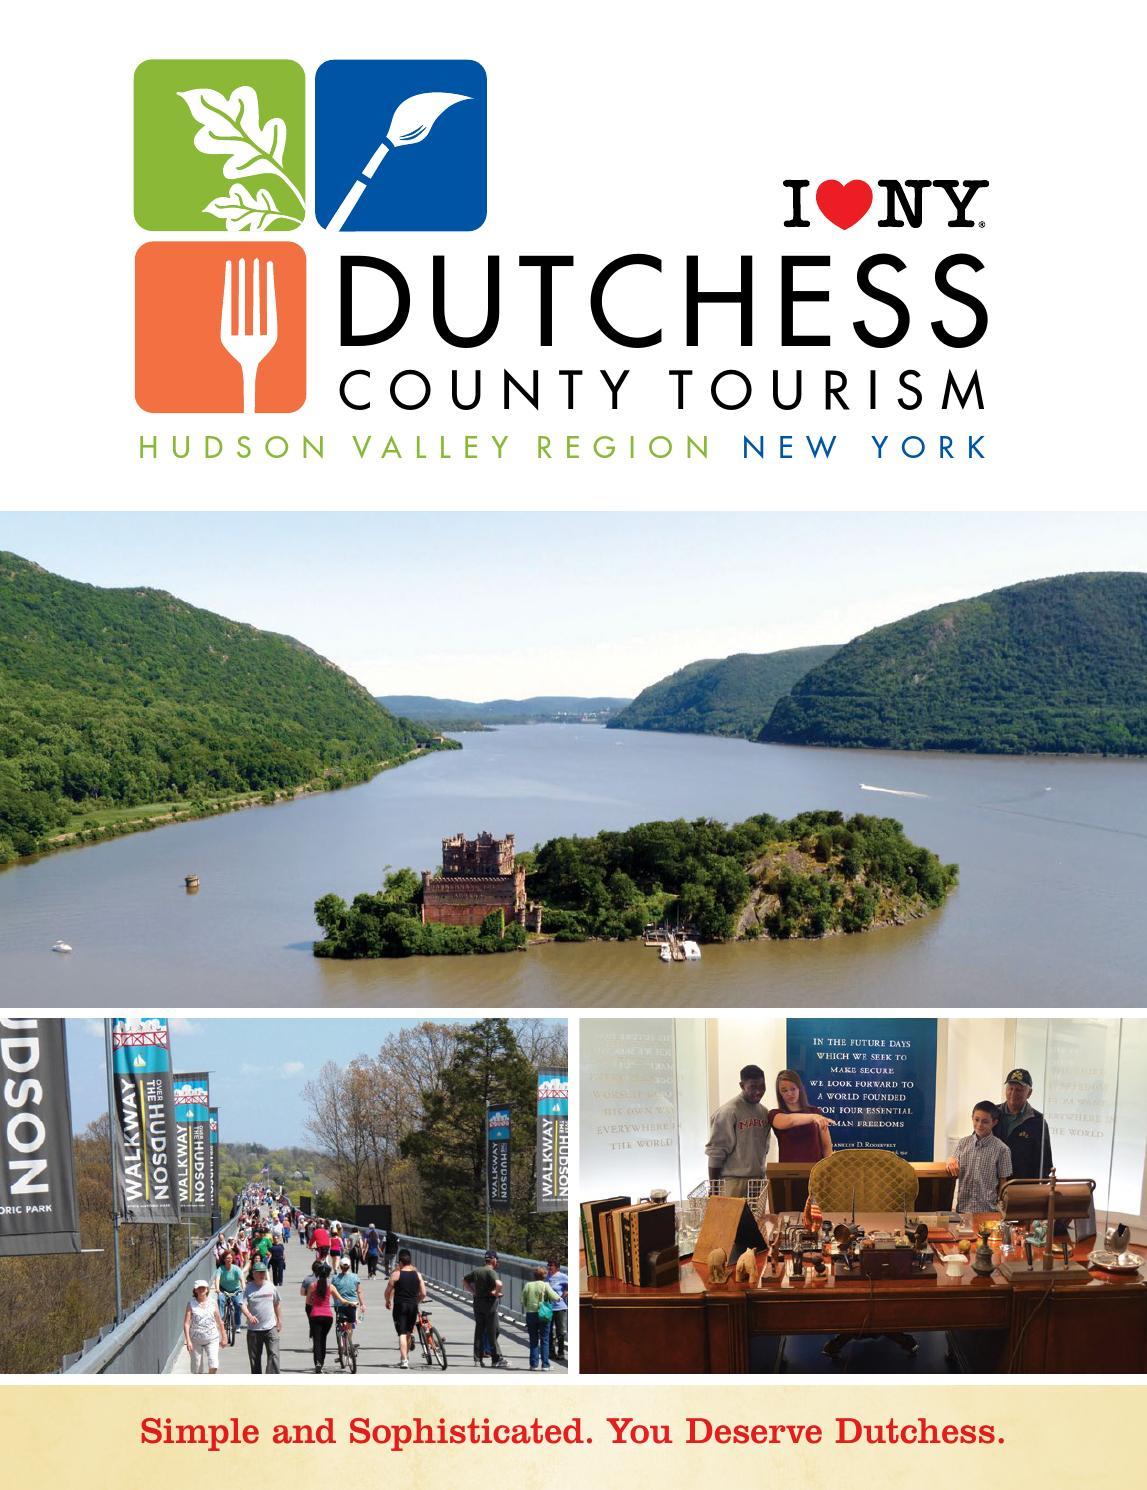 2014 Dutchess County Tourism Travel Guide By Chronogram Media Issuu